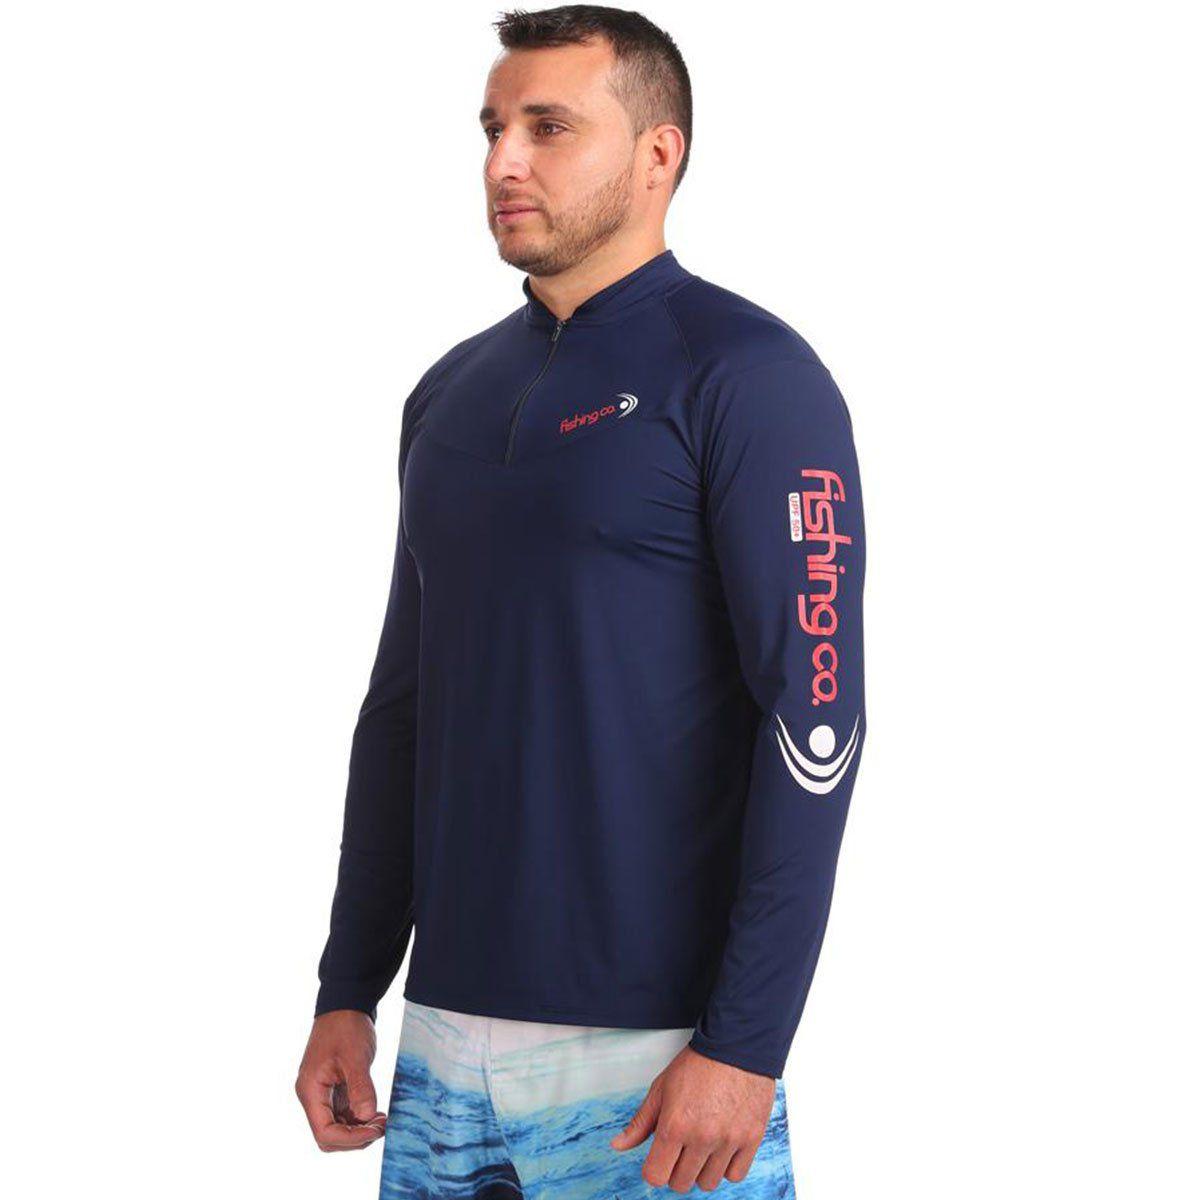 Camiseta Fishing Co Masculina Ziper Marinho